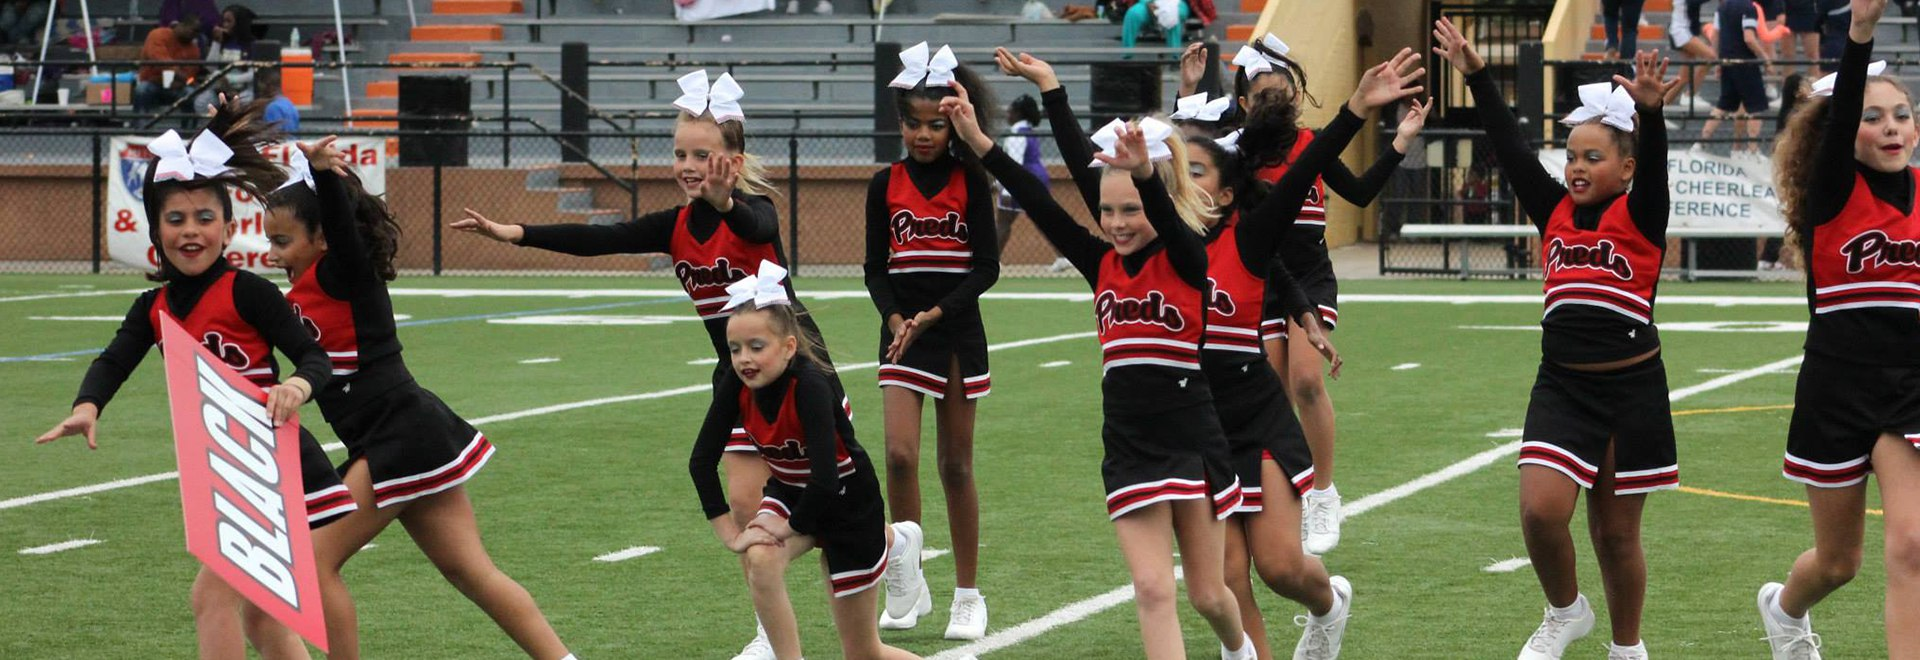 East Orlando Junior Predators Youth Cheerleading